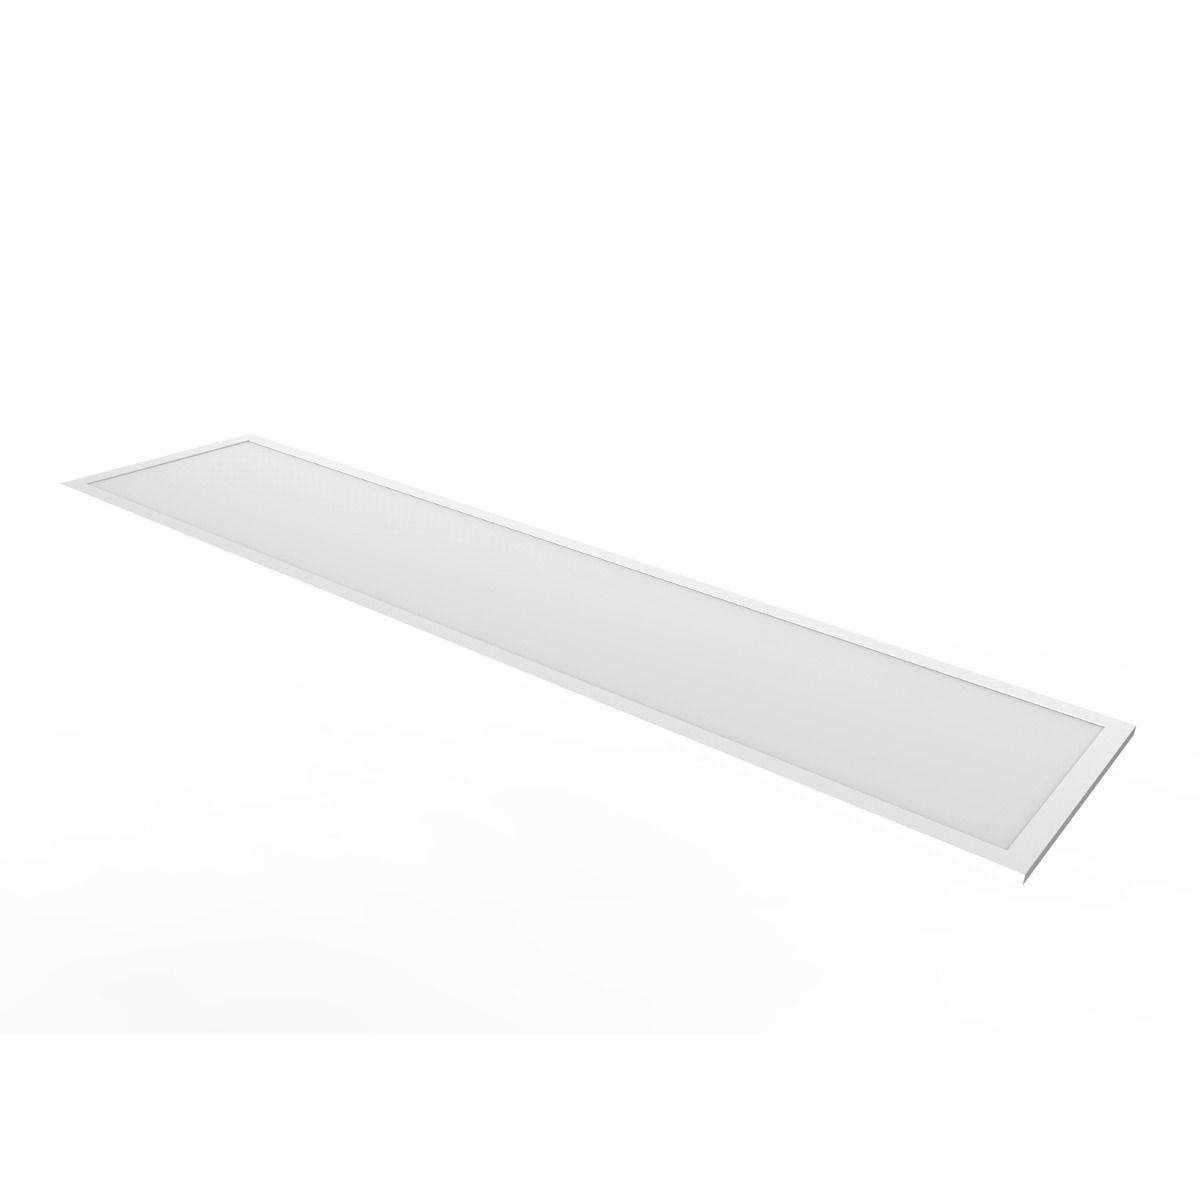 Noxion LED Panel Ecowhite V2.0 30x120cm 4000K 36W UGR <19   Cool White - Replaces 2x36W